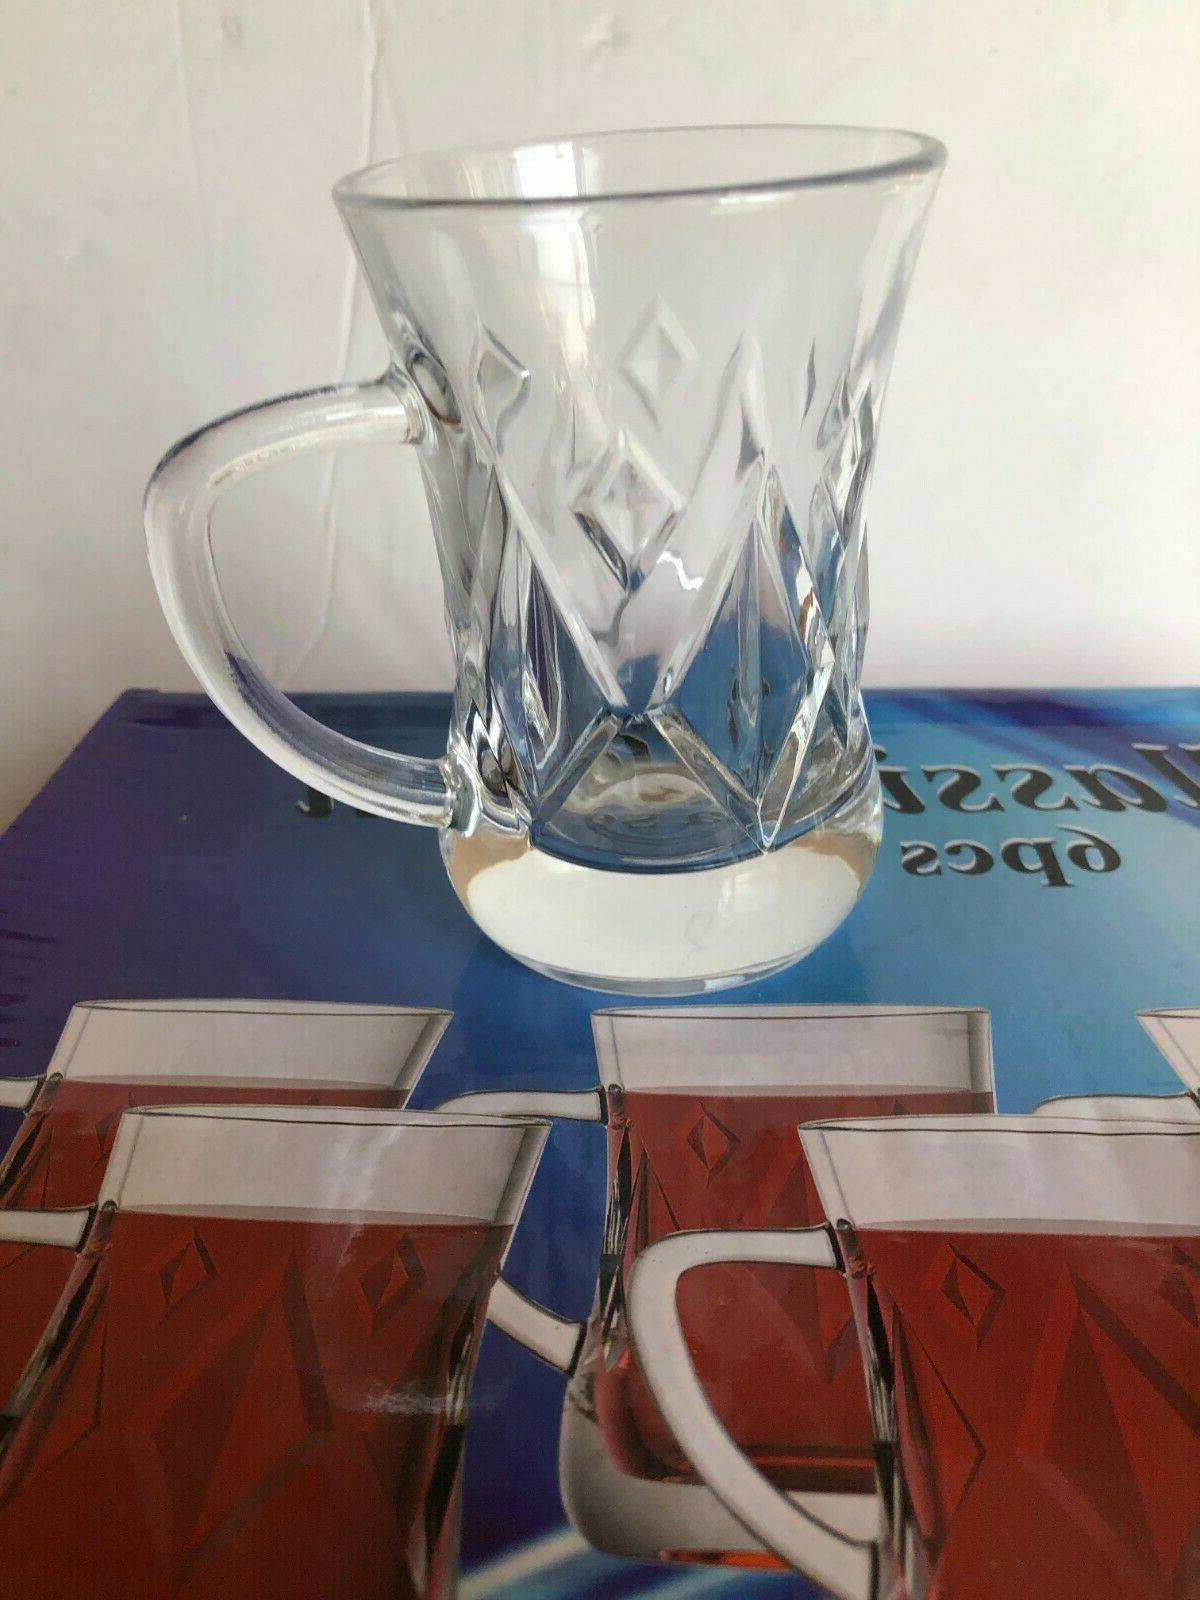 Turkish Tea /Tea Clear with